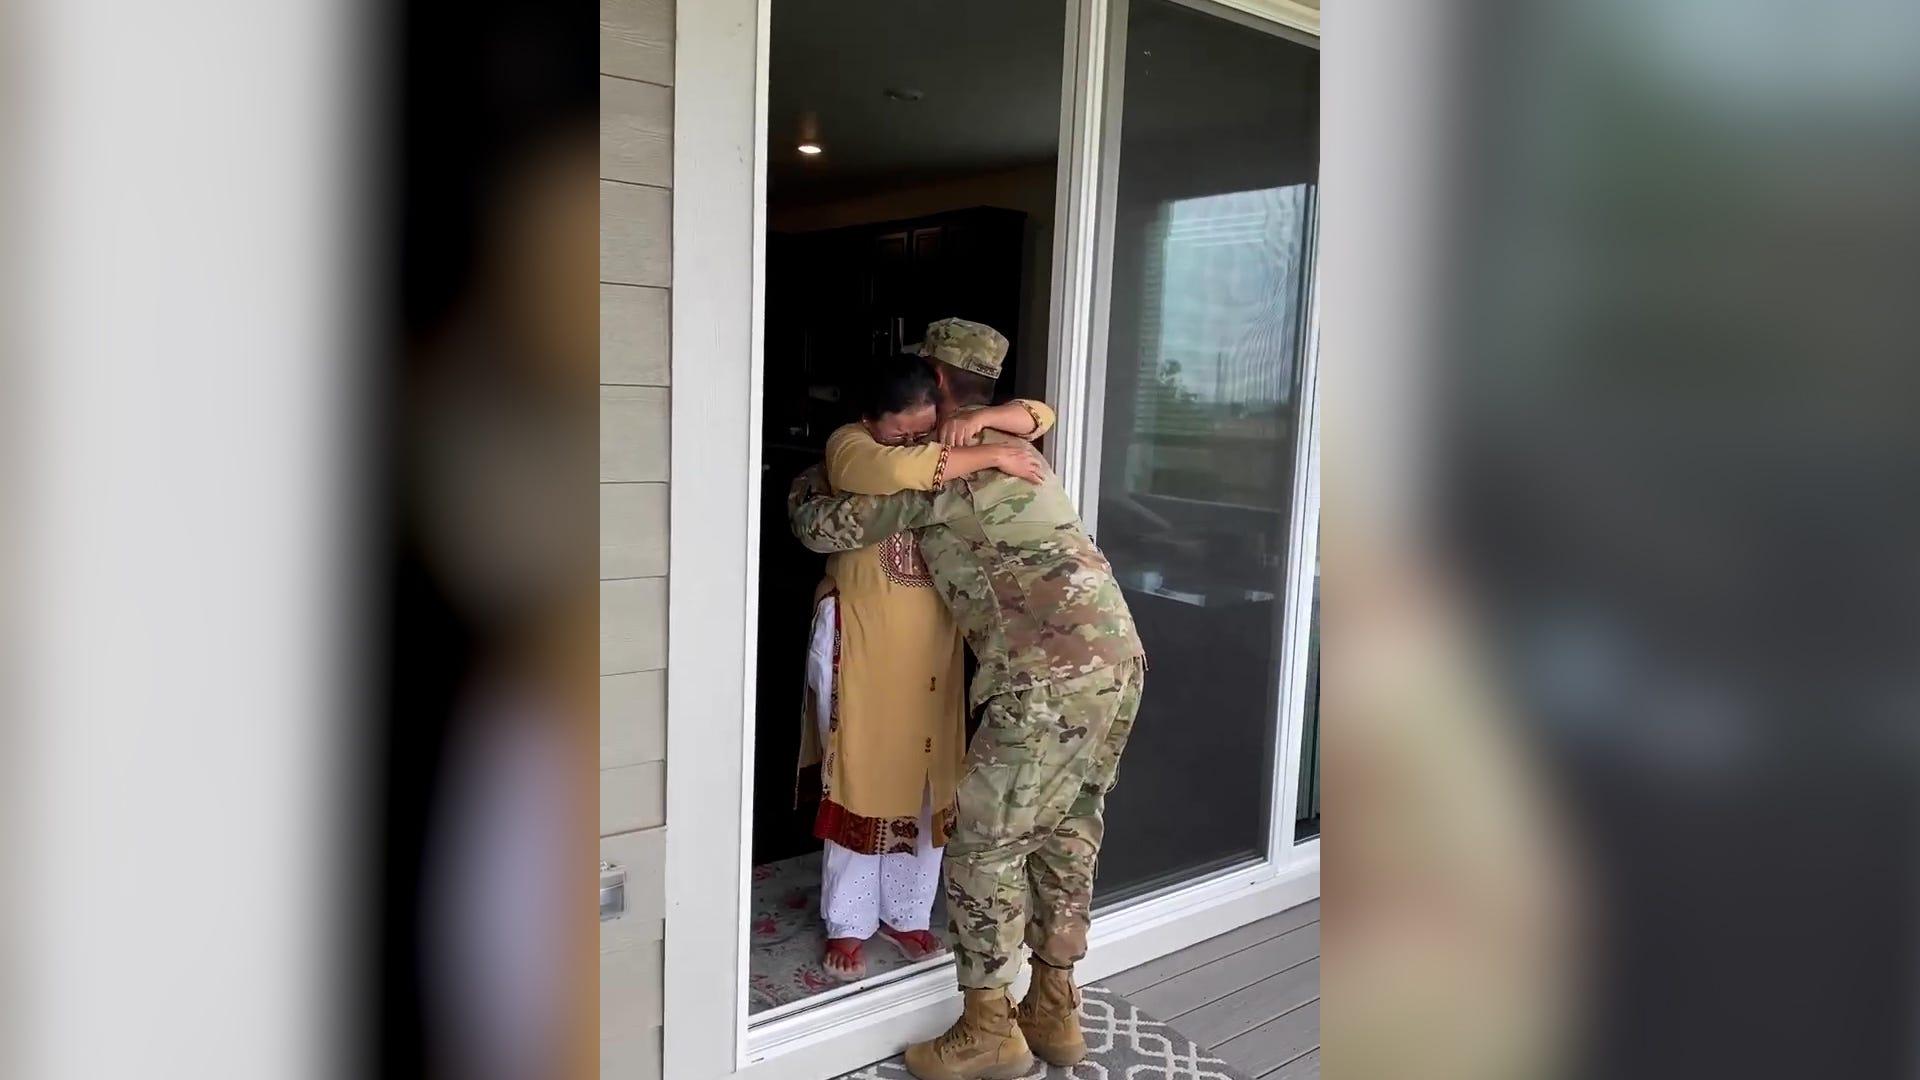 Grandma's hug is everything to returning soldier